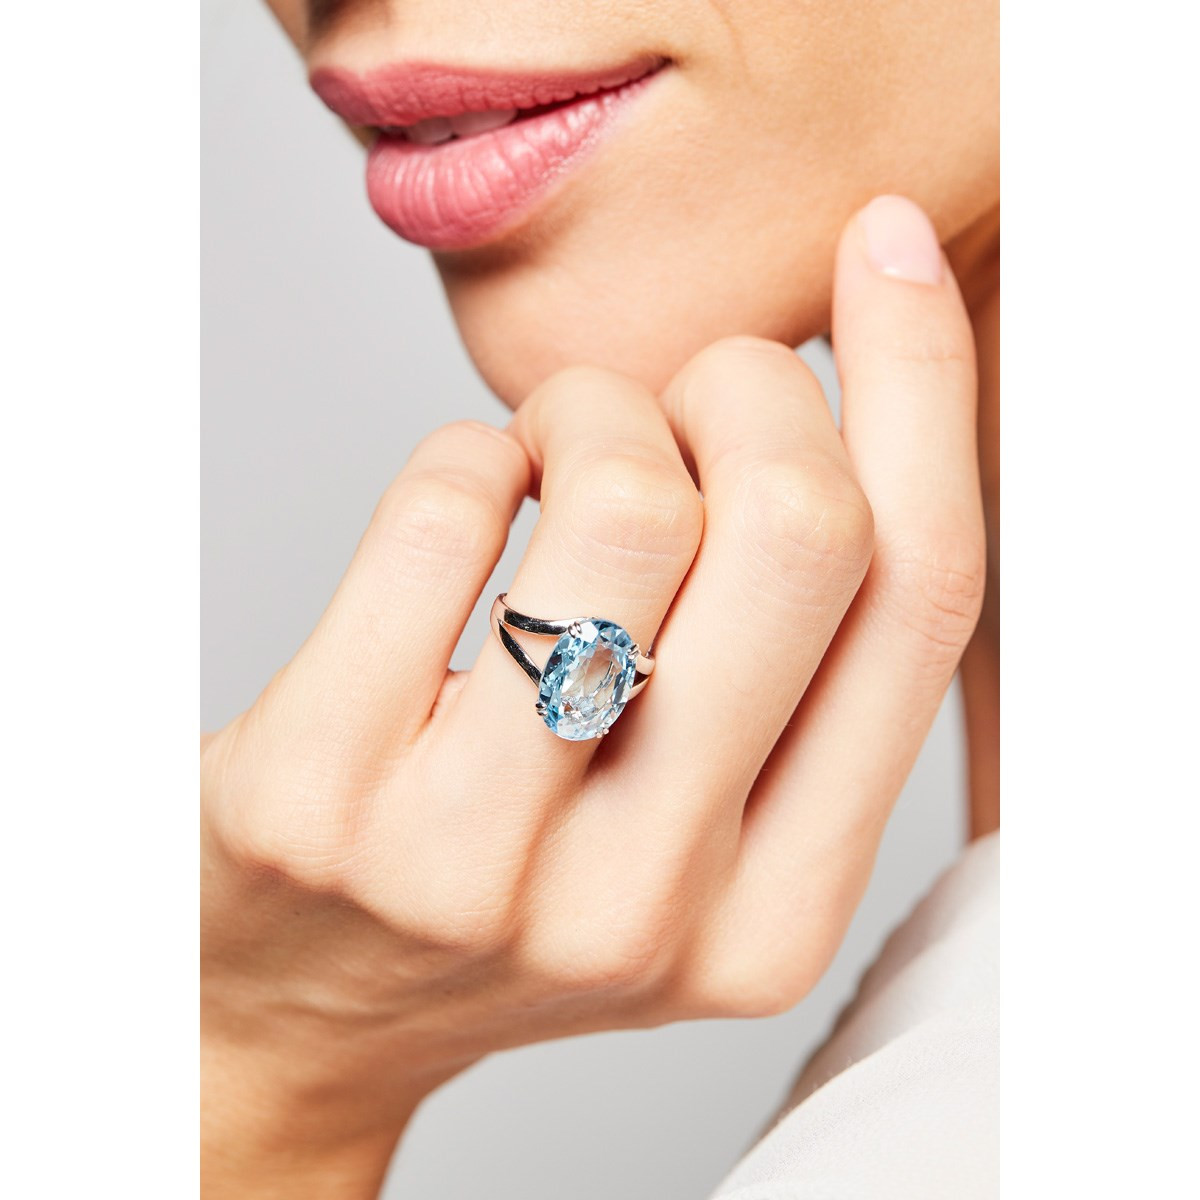 "Bague Or Blanc ""PATTAYA"" Diamants 0,05 carat et Topaze Bleue 6,4 carat"